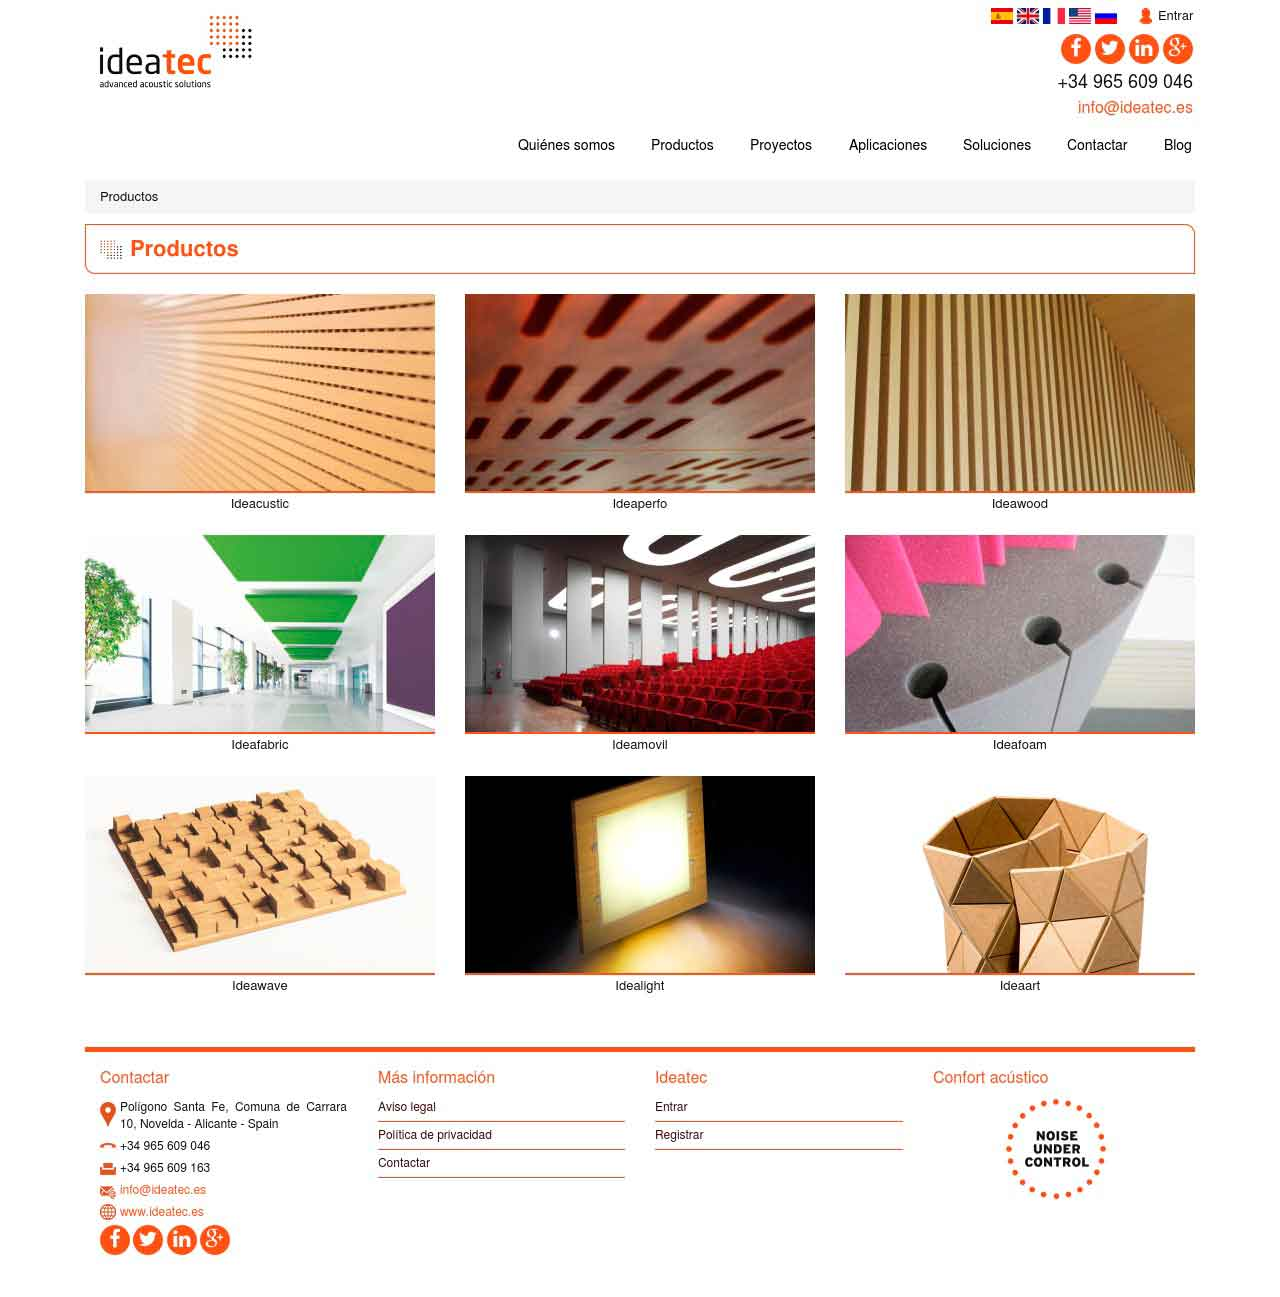 Agencia Sidecar ideatec-productos-agencia-sidecar Ideatec